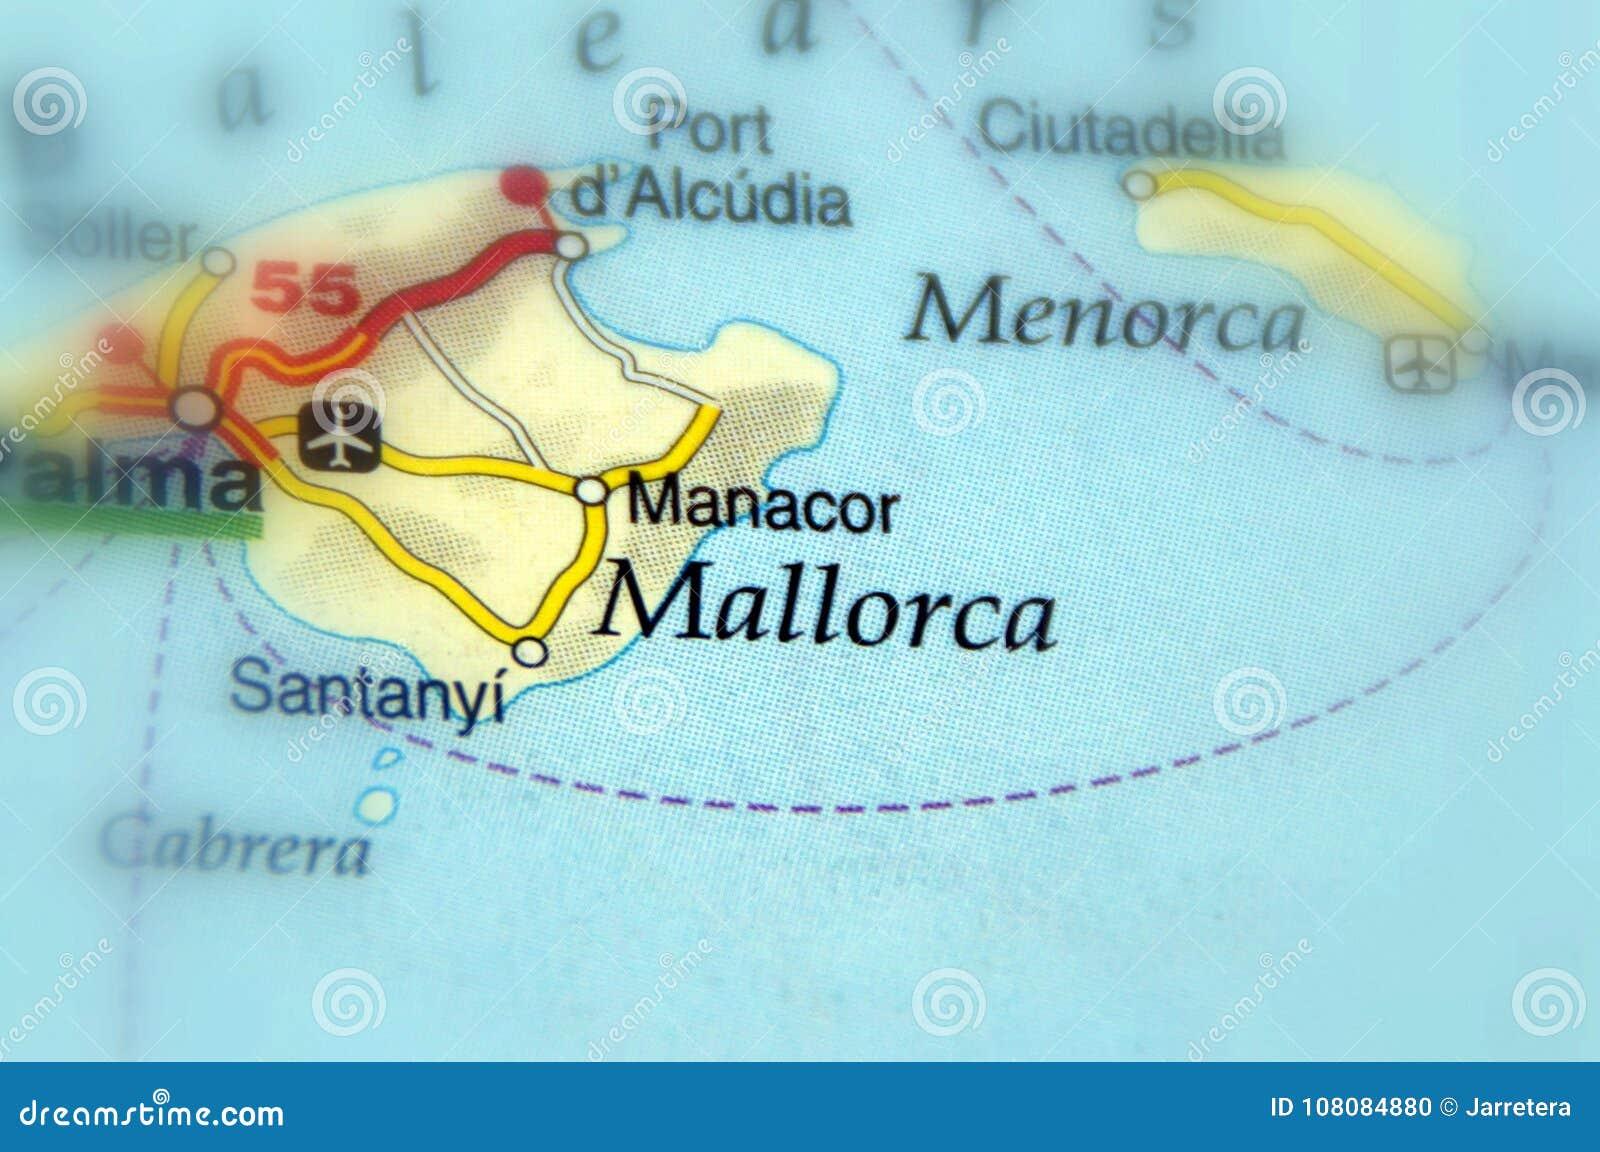 Picture of: Mallorca Spain Europe Eu Stock Photo Image Of City Arnhem 108084880